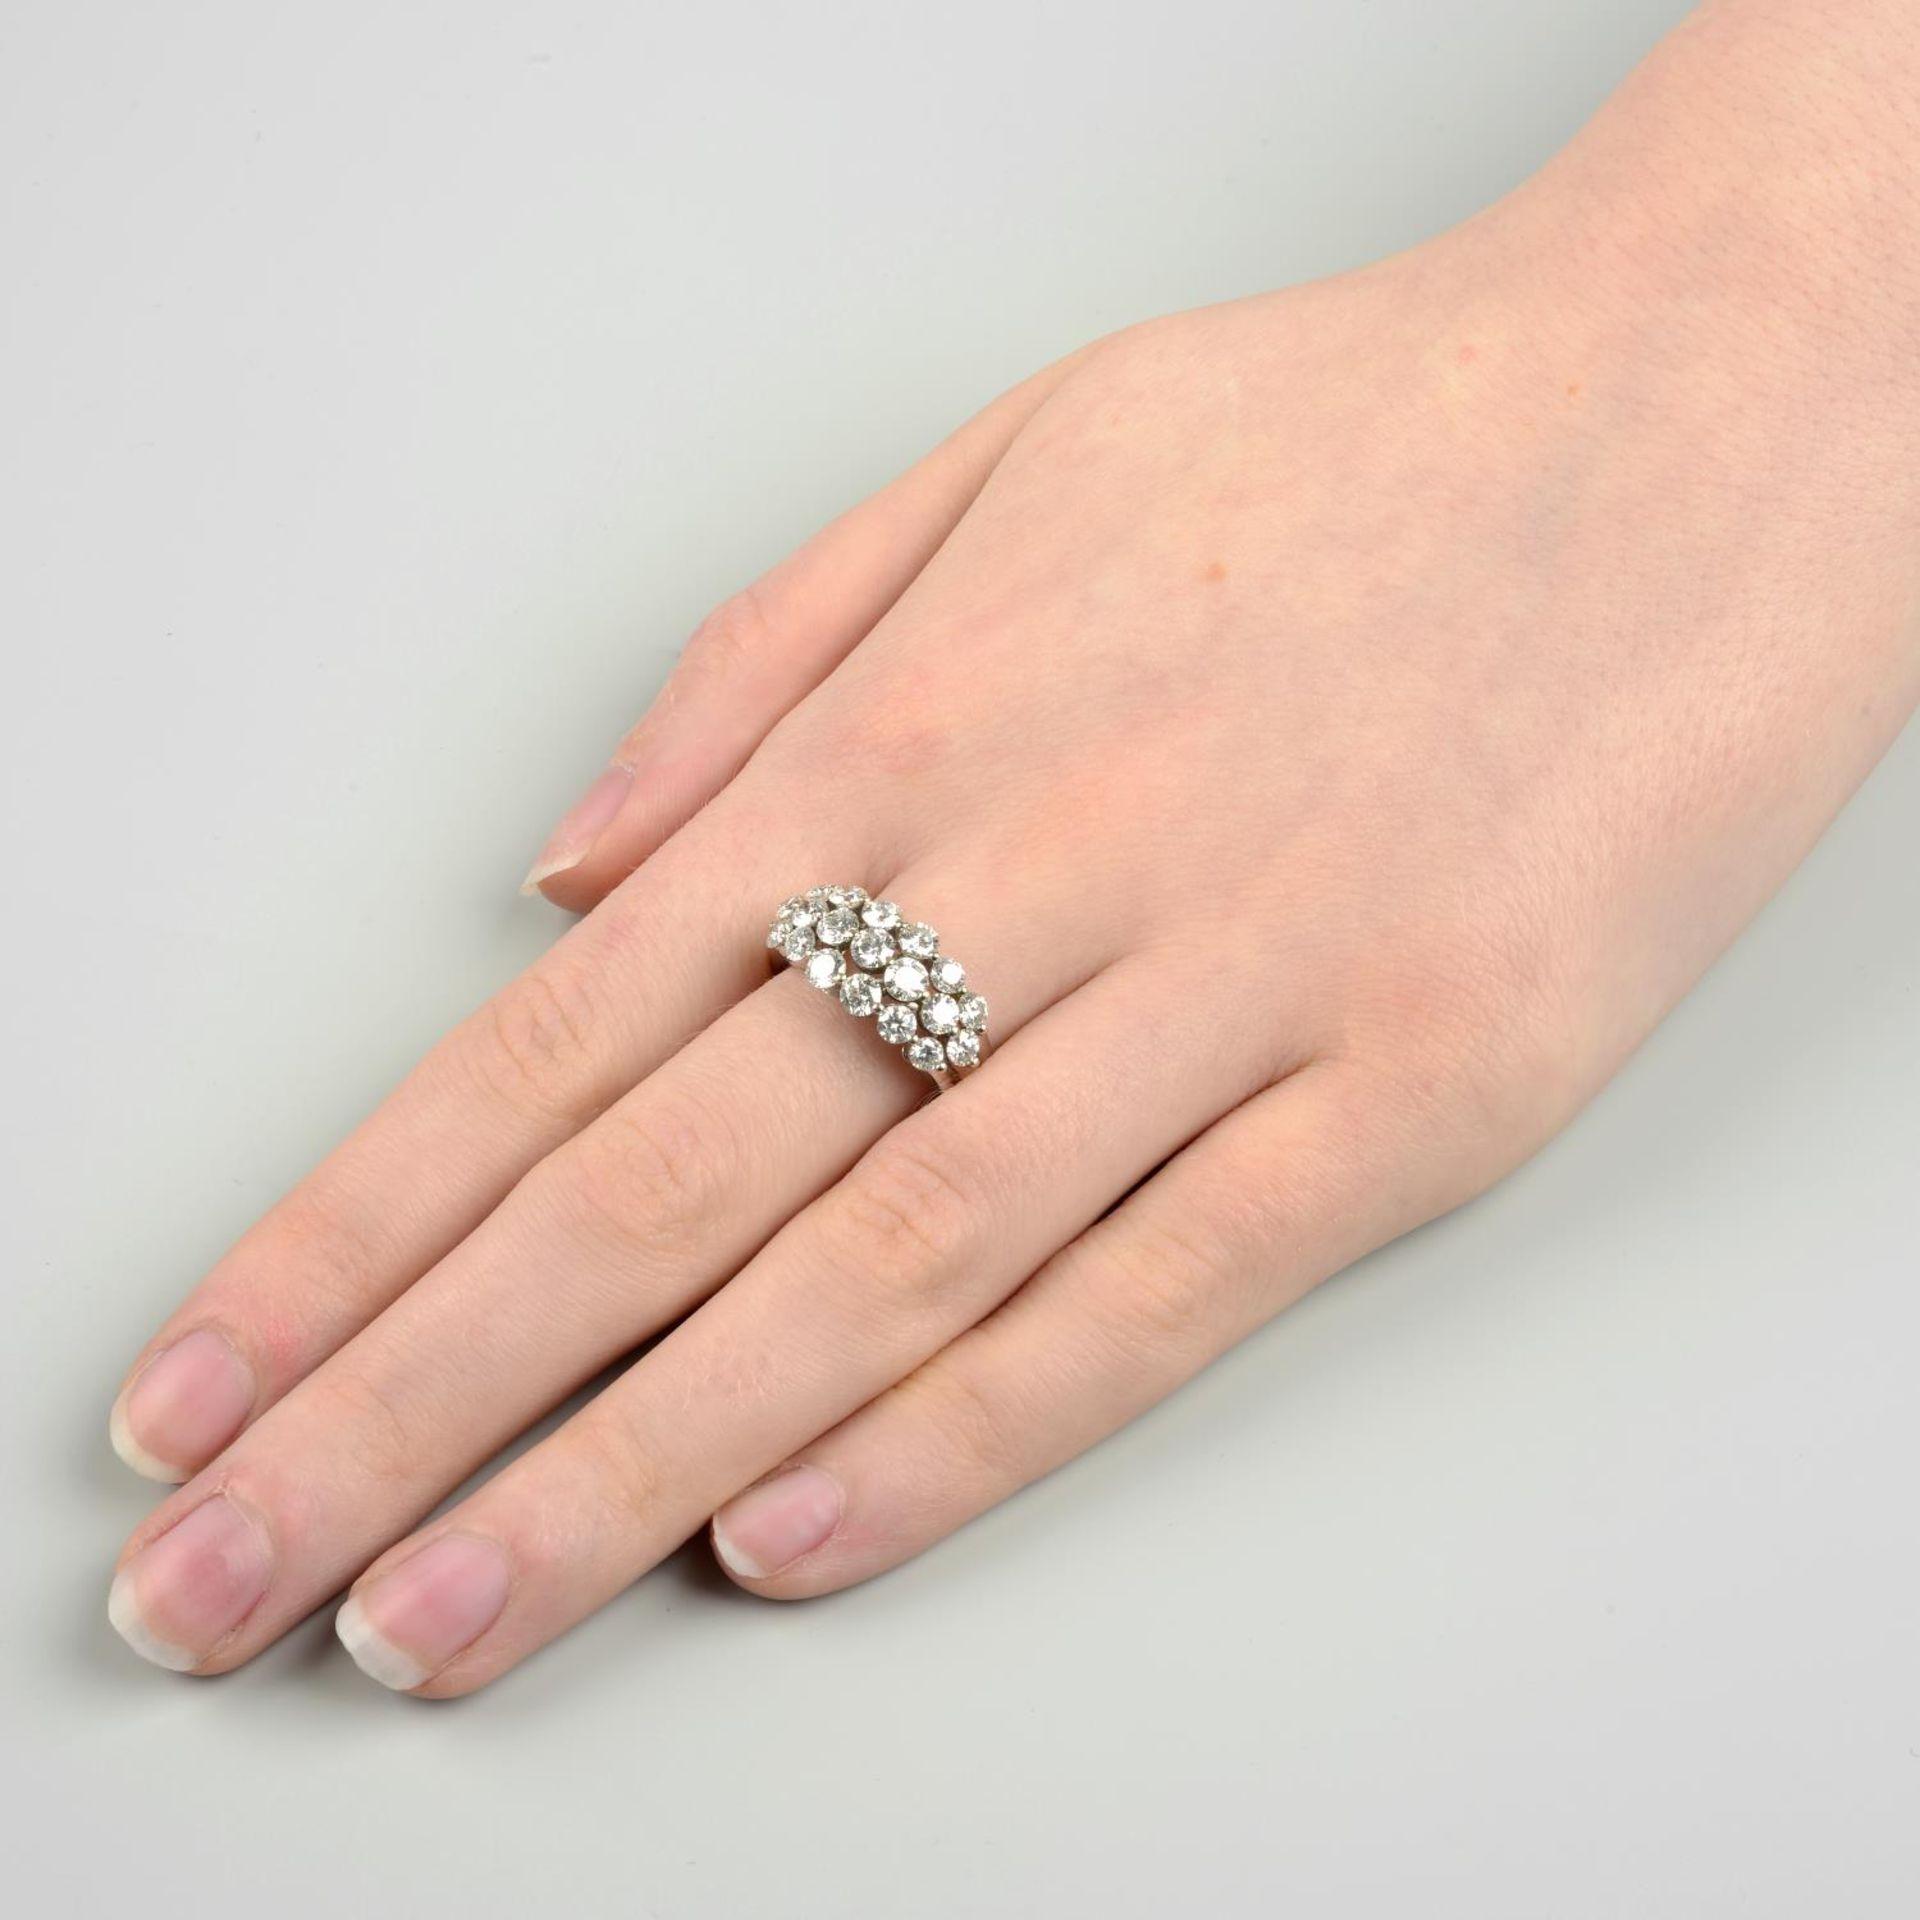 A brilliant-cut diamond dress ring. - Image 3 of 6